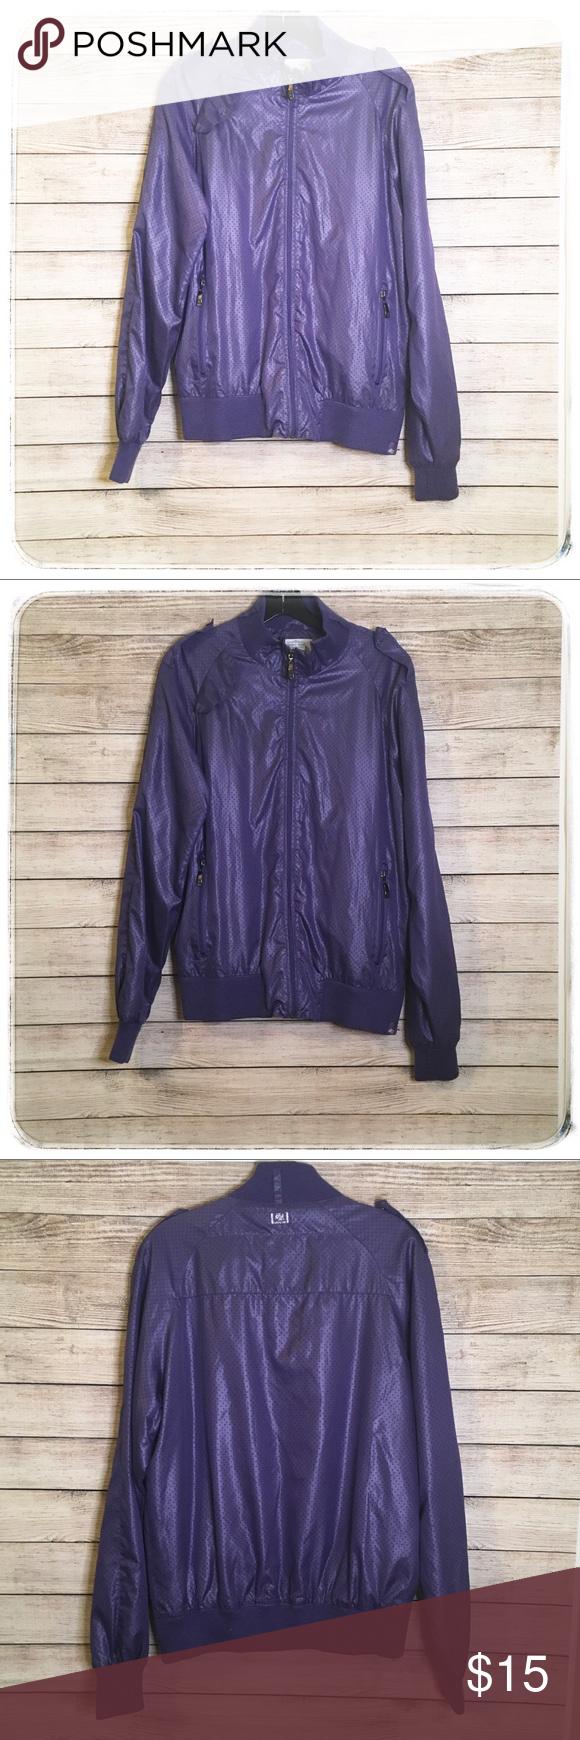 Smoke Rise Men S Jacket Size Medium Purple Bomber Jacket Jackets Mens Jackets [ 1740 x 580 Pixel ]